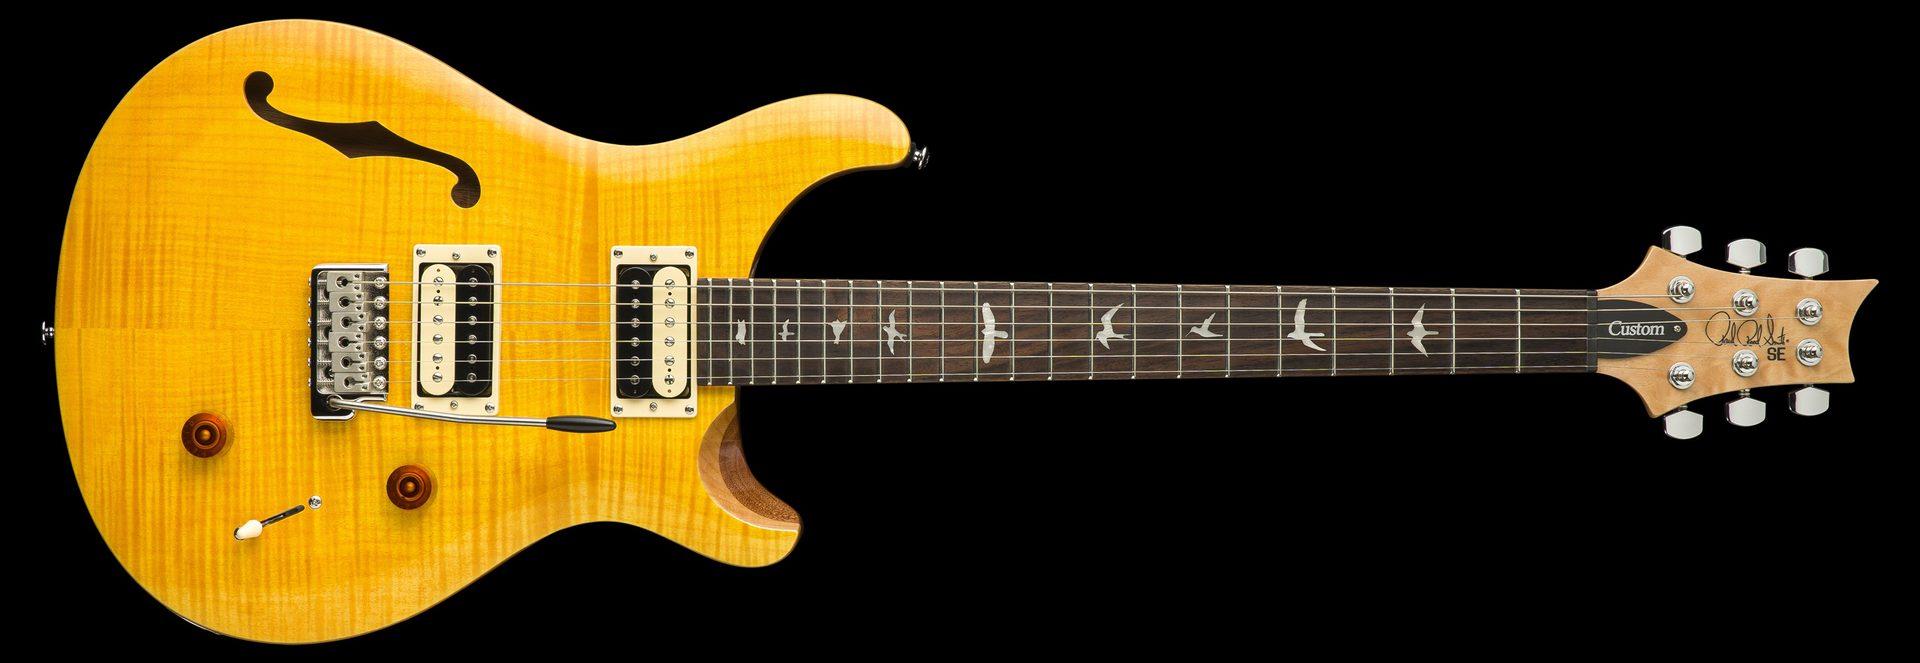 Santana Yellow